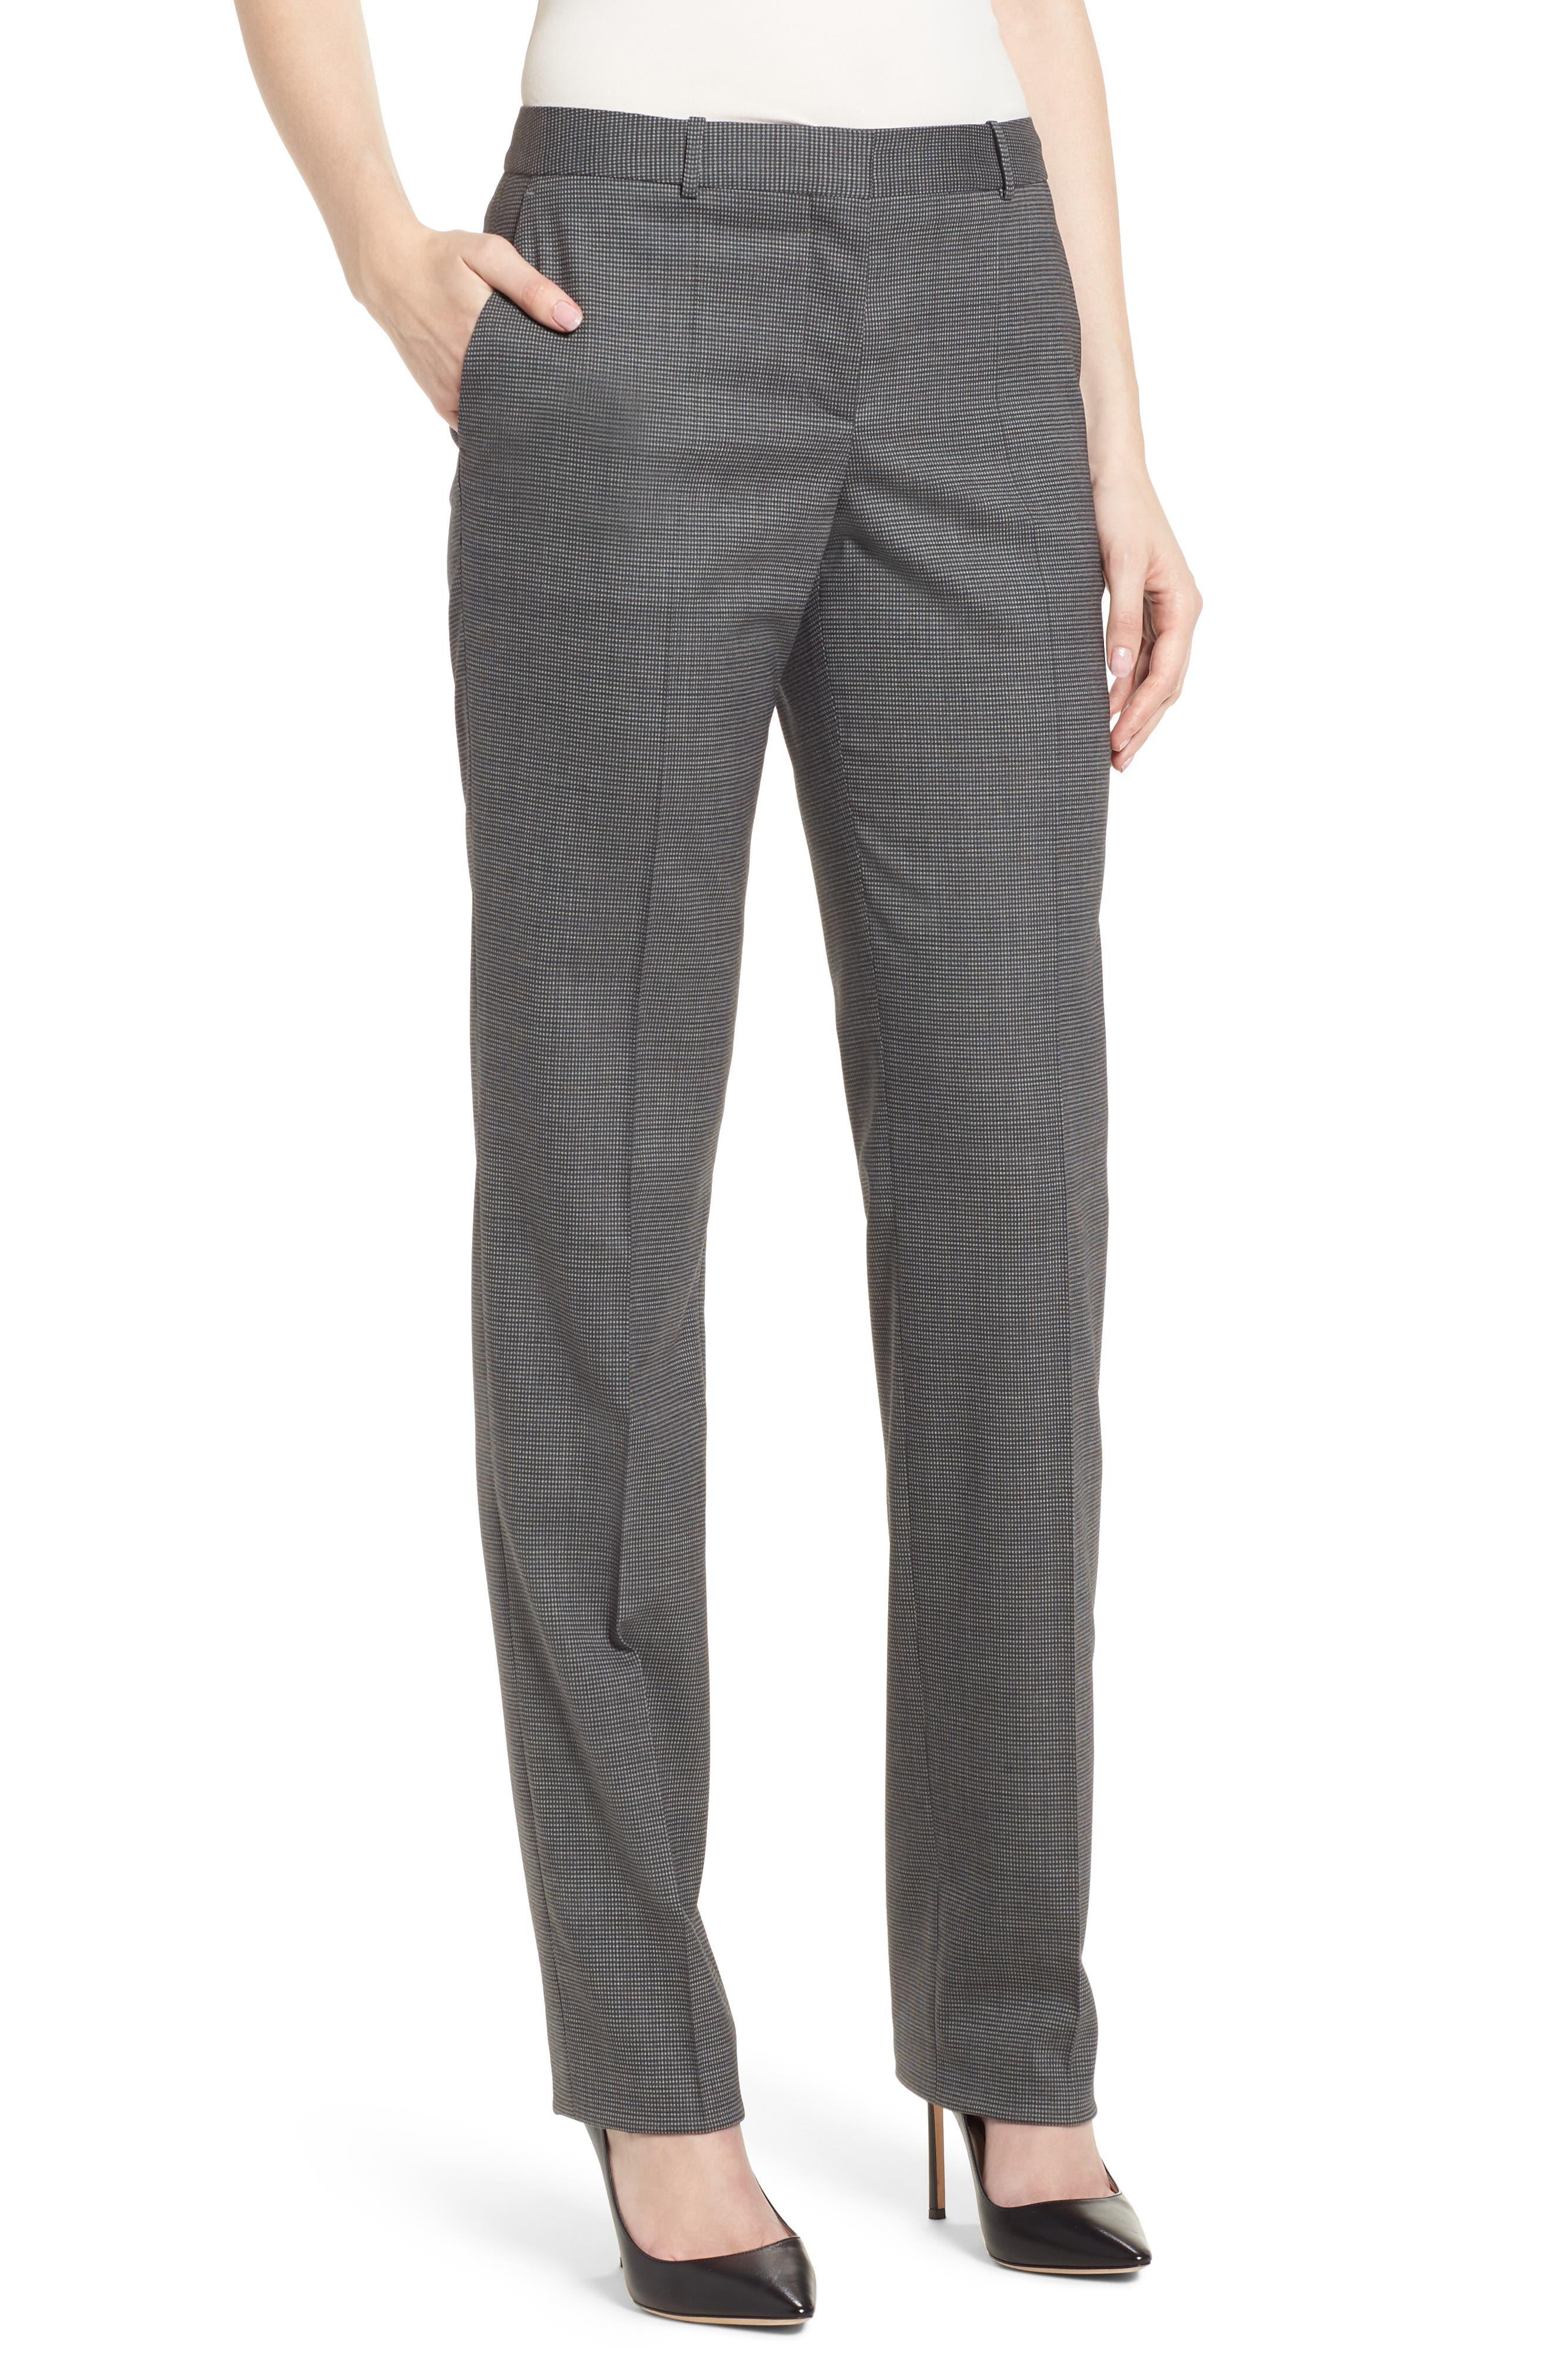 Tamea Minidessin Trousers,                         Main,                         color, Cozy Grey Fantasy